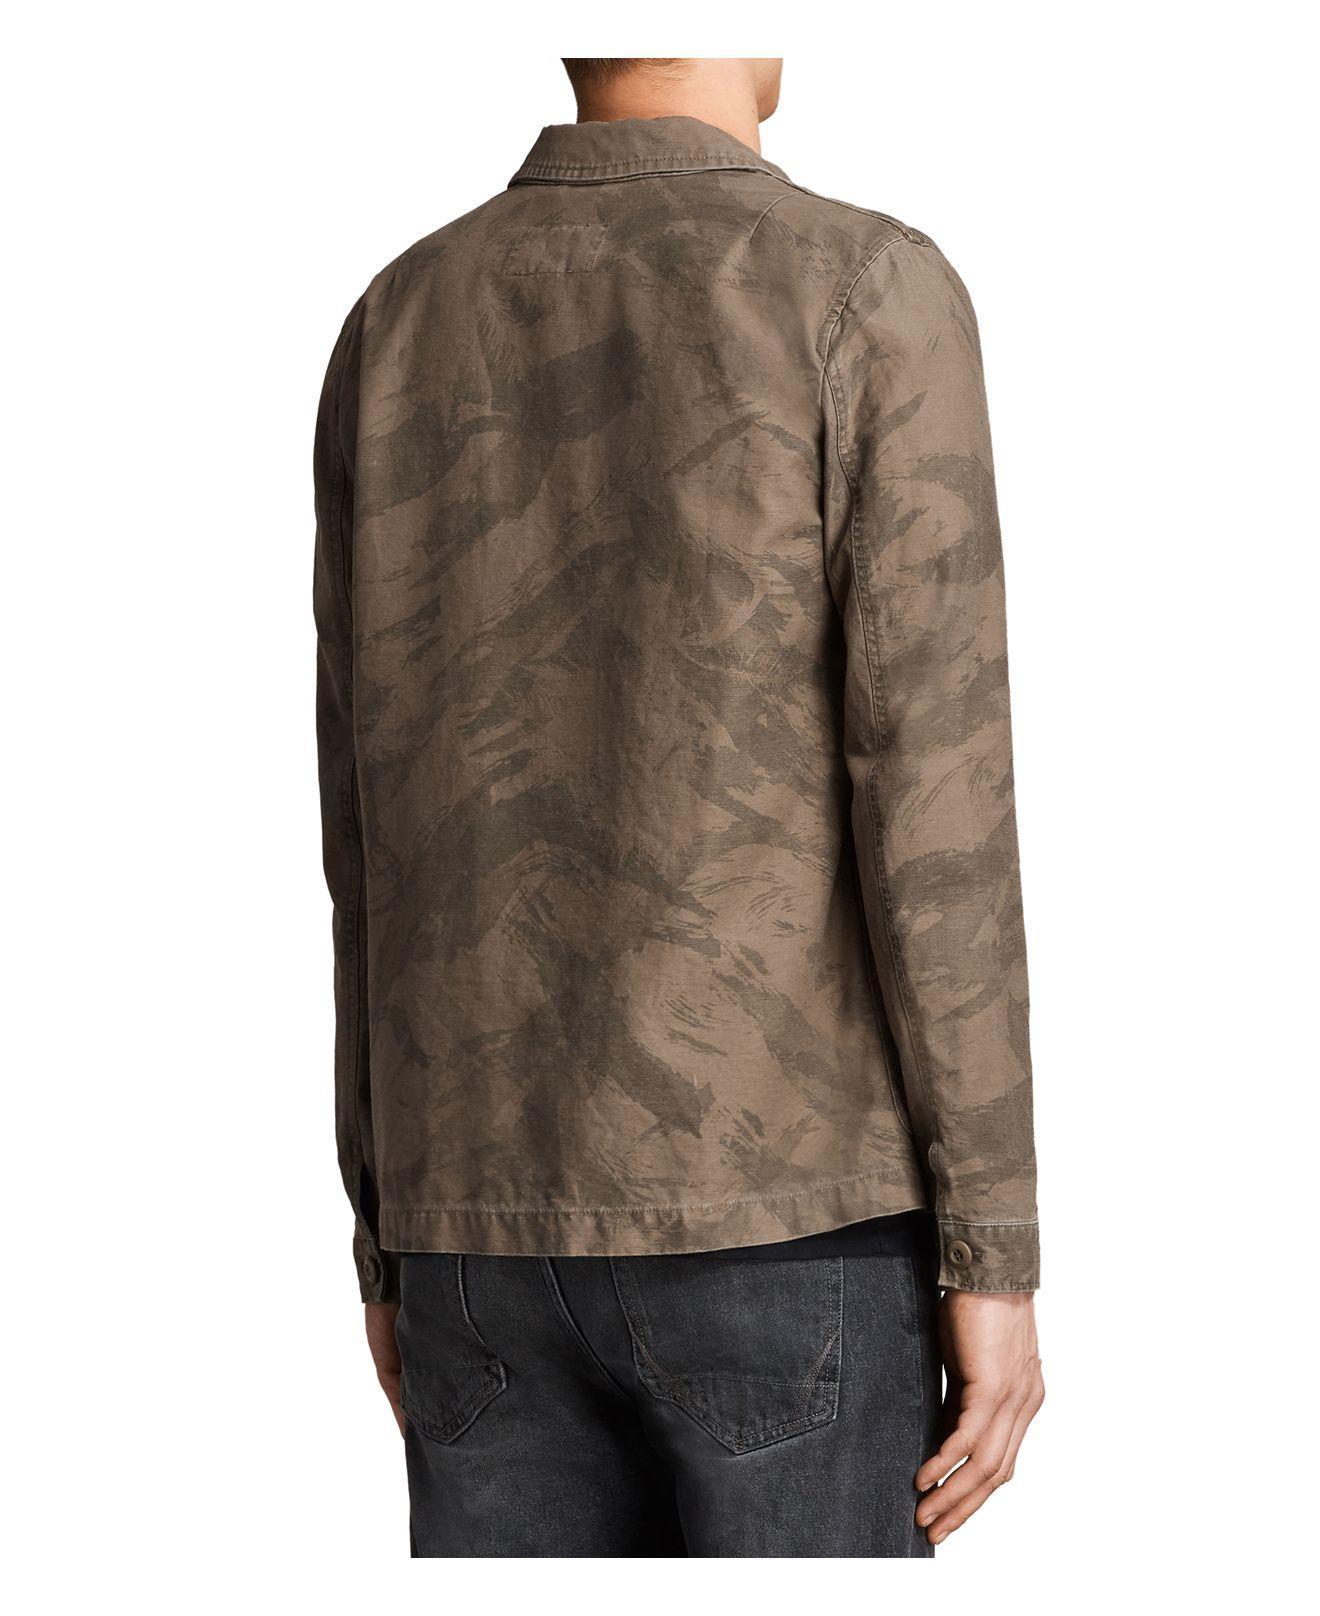 AllSaints Yasuko Jacket in Khaki Brown (Brown) for Men